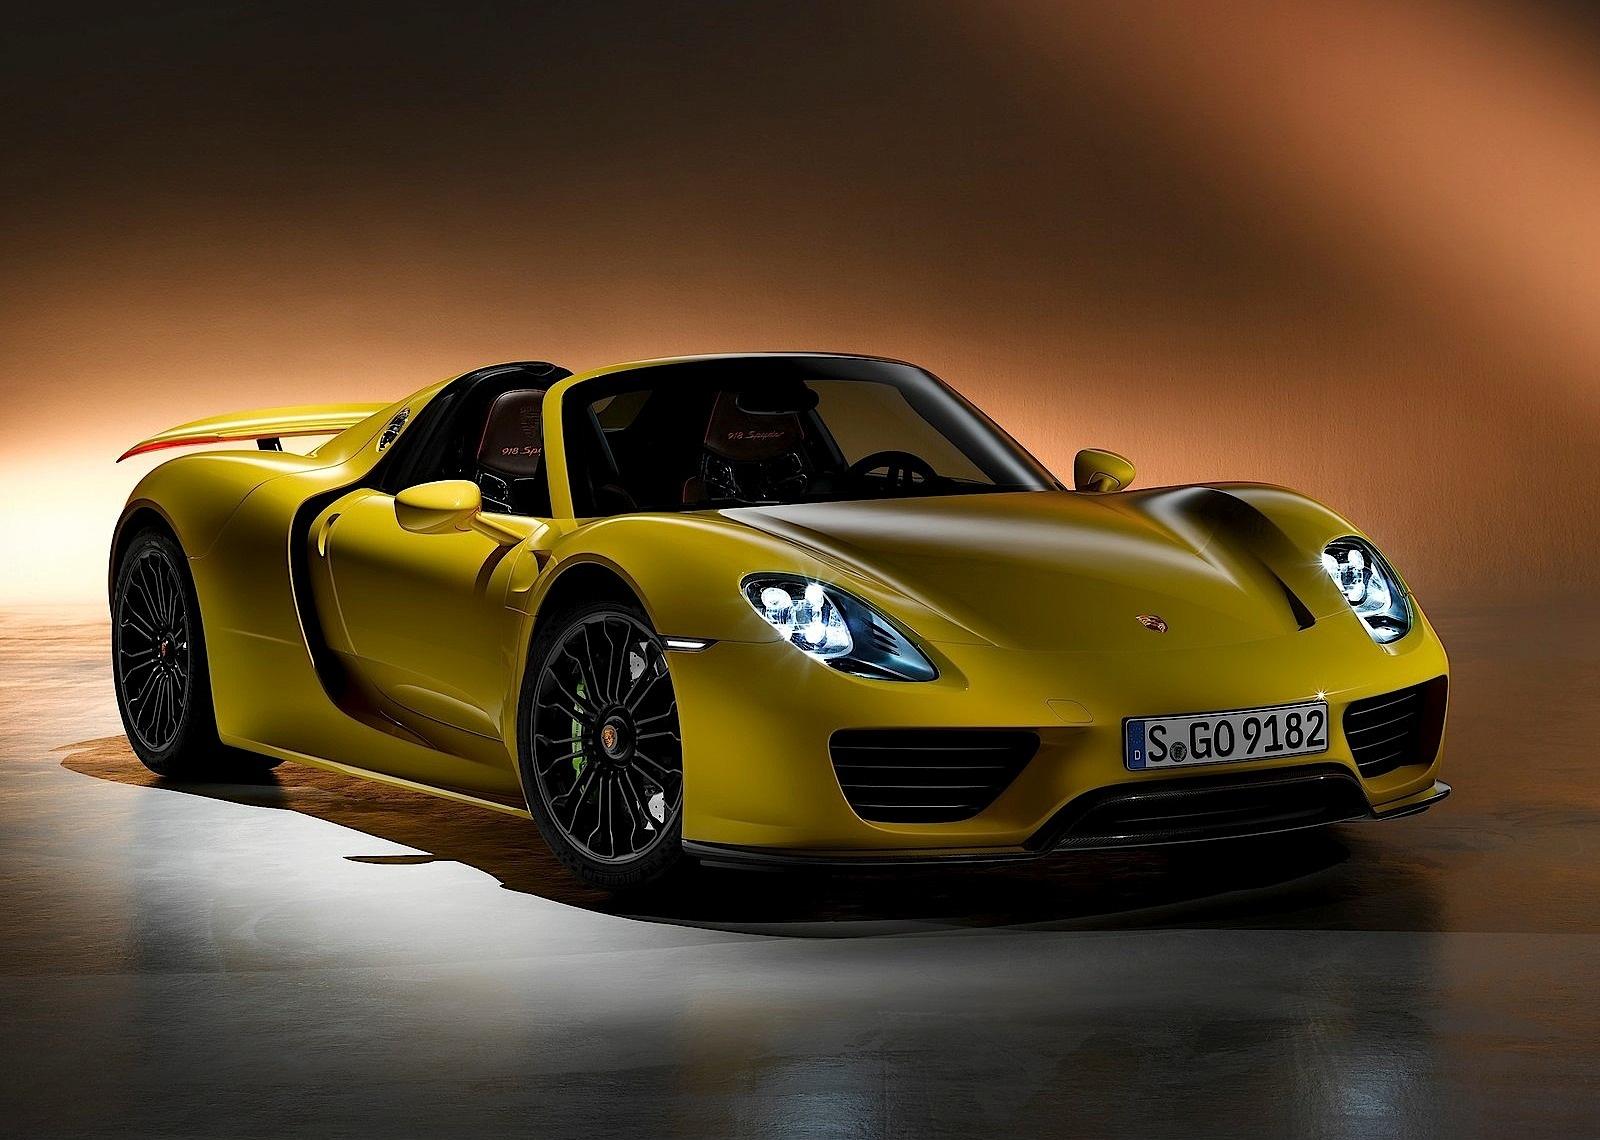 porsche 918 spyder 2014 present - Porsche Spyder 918 2015